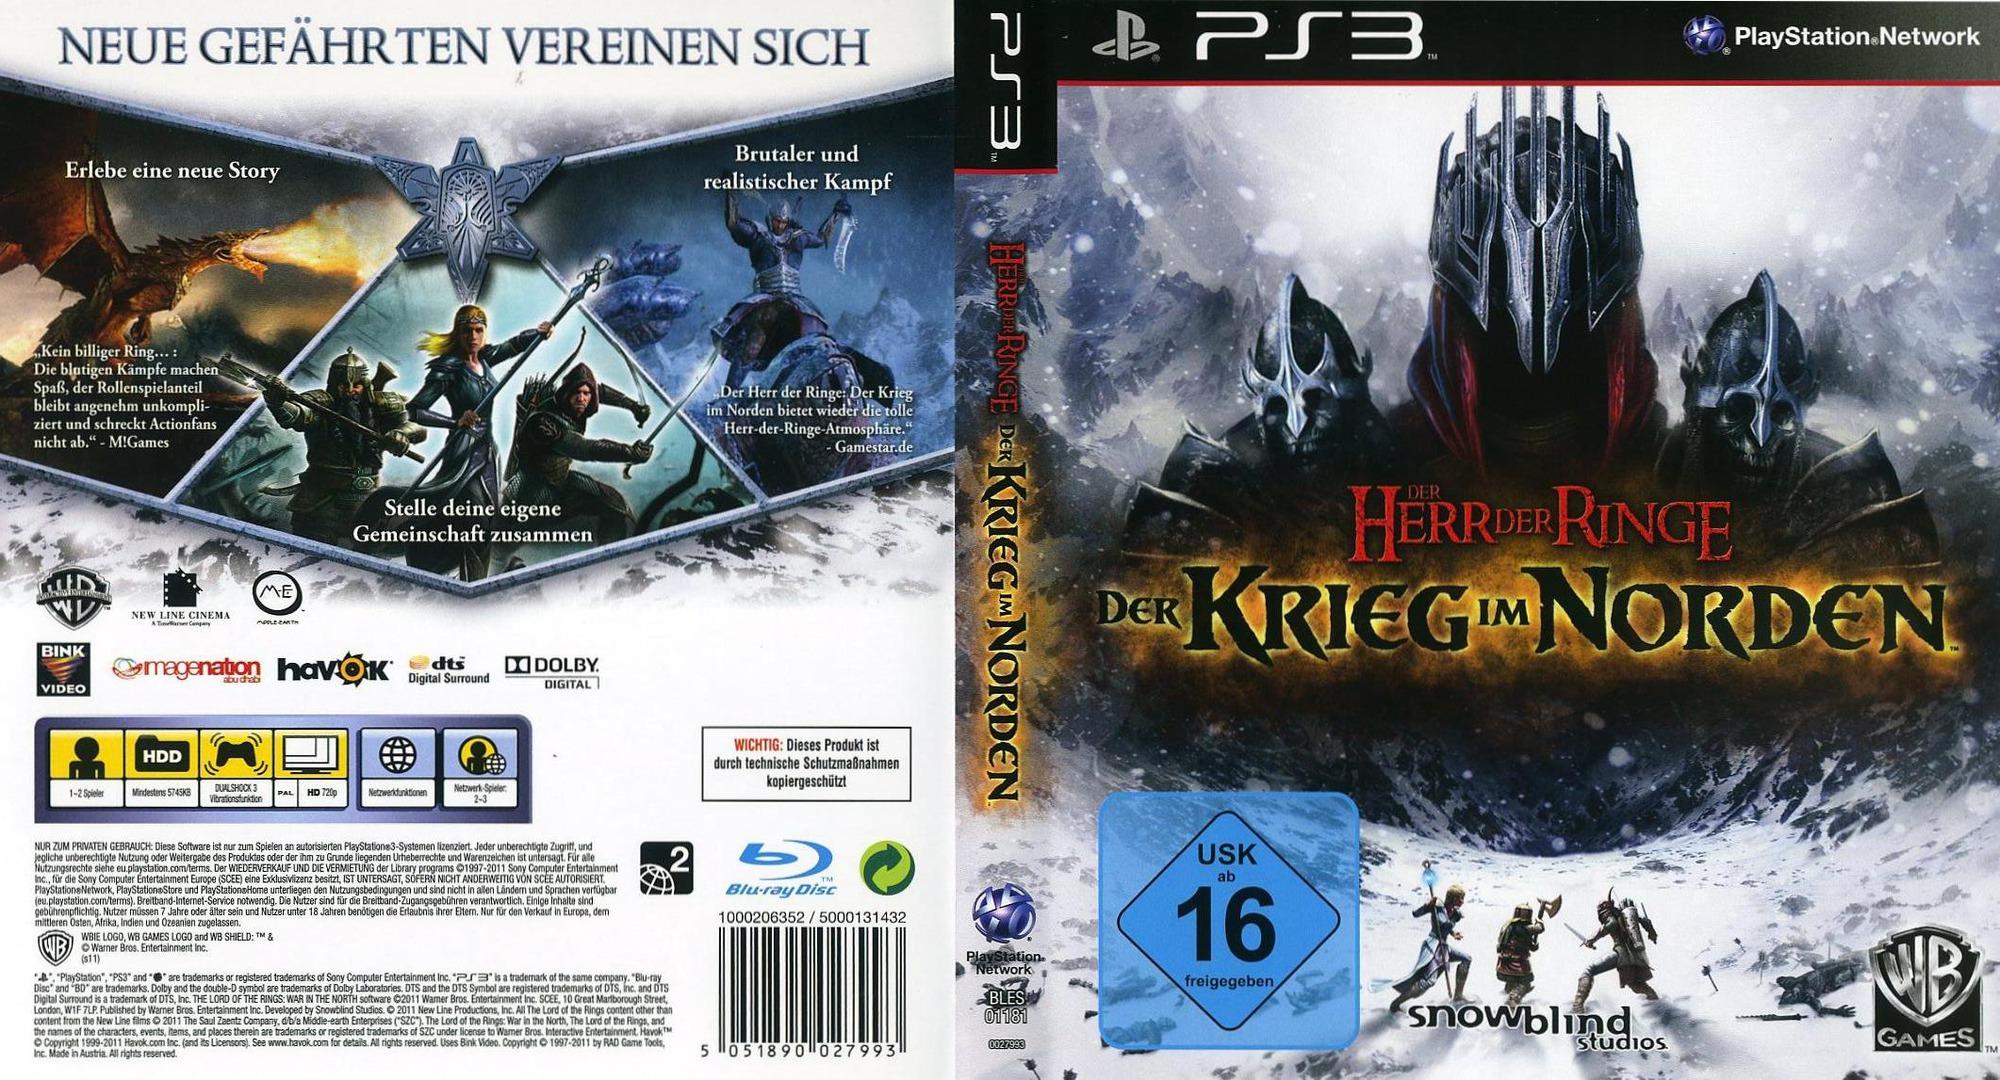 Der Herr der Ringe: der Krieg im Norden PS3 coverfullHQ (BLES01181)